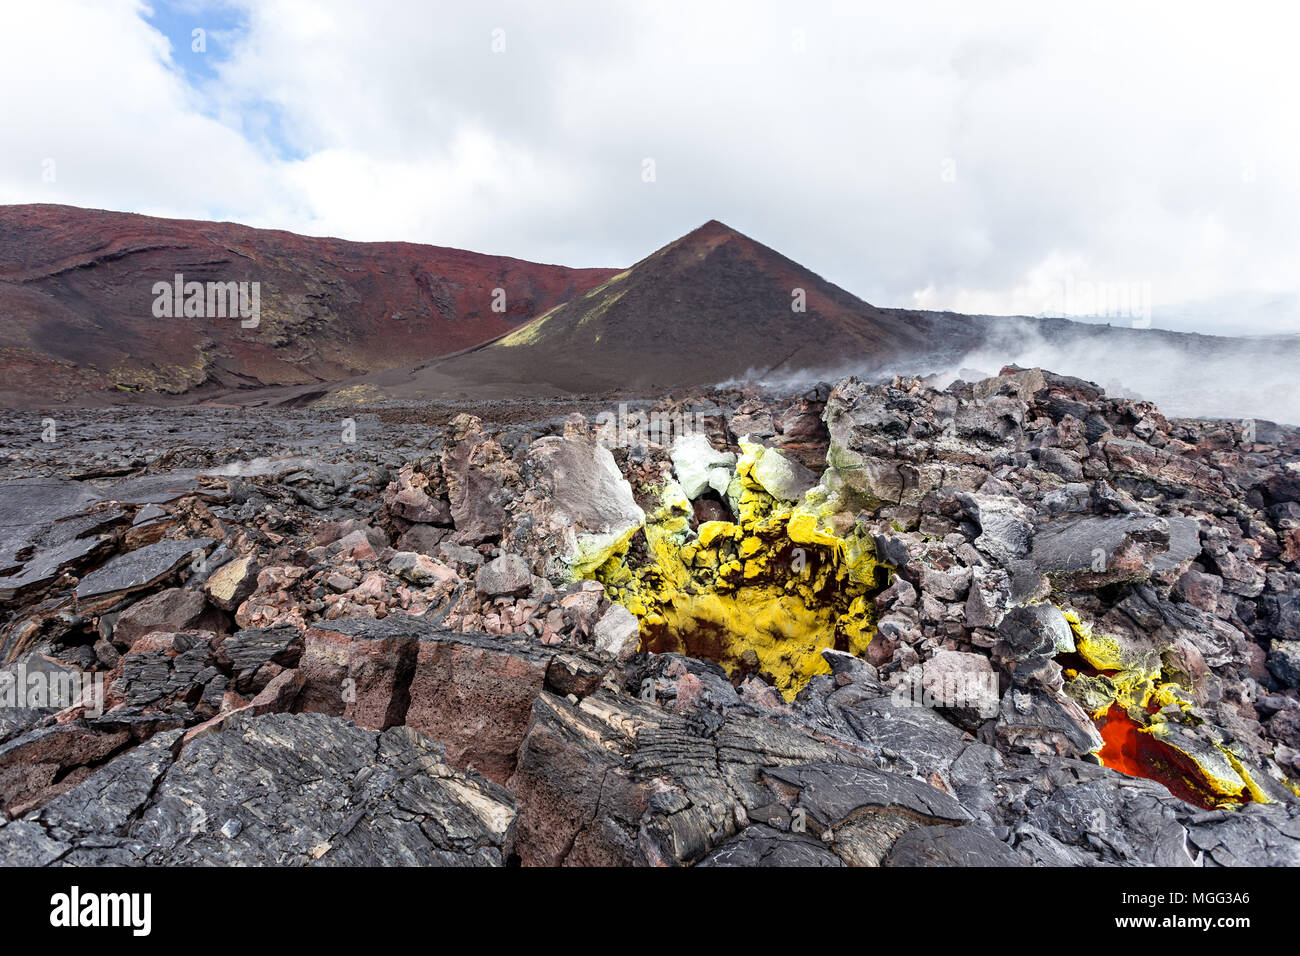 Active fumaroles near volcano Tolbachik, Kamchatka Peninsula, Russia - Stock Image